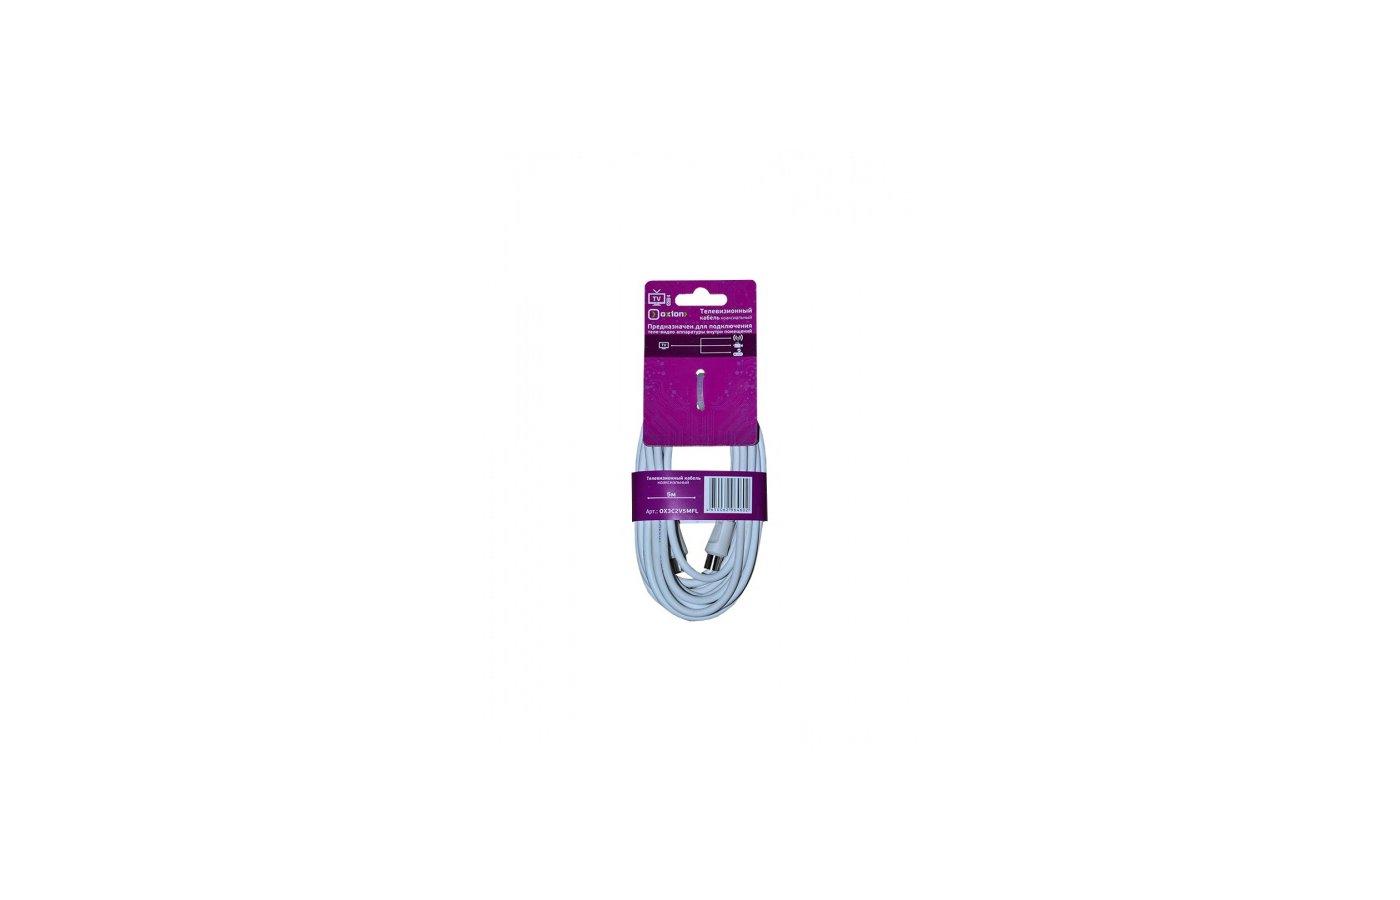 Кабель OXION Coax(m) - Coax(f) 20м. (OX3C2V20MFL)